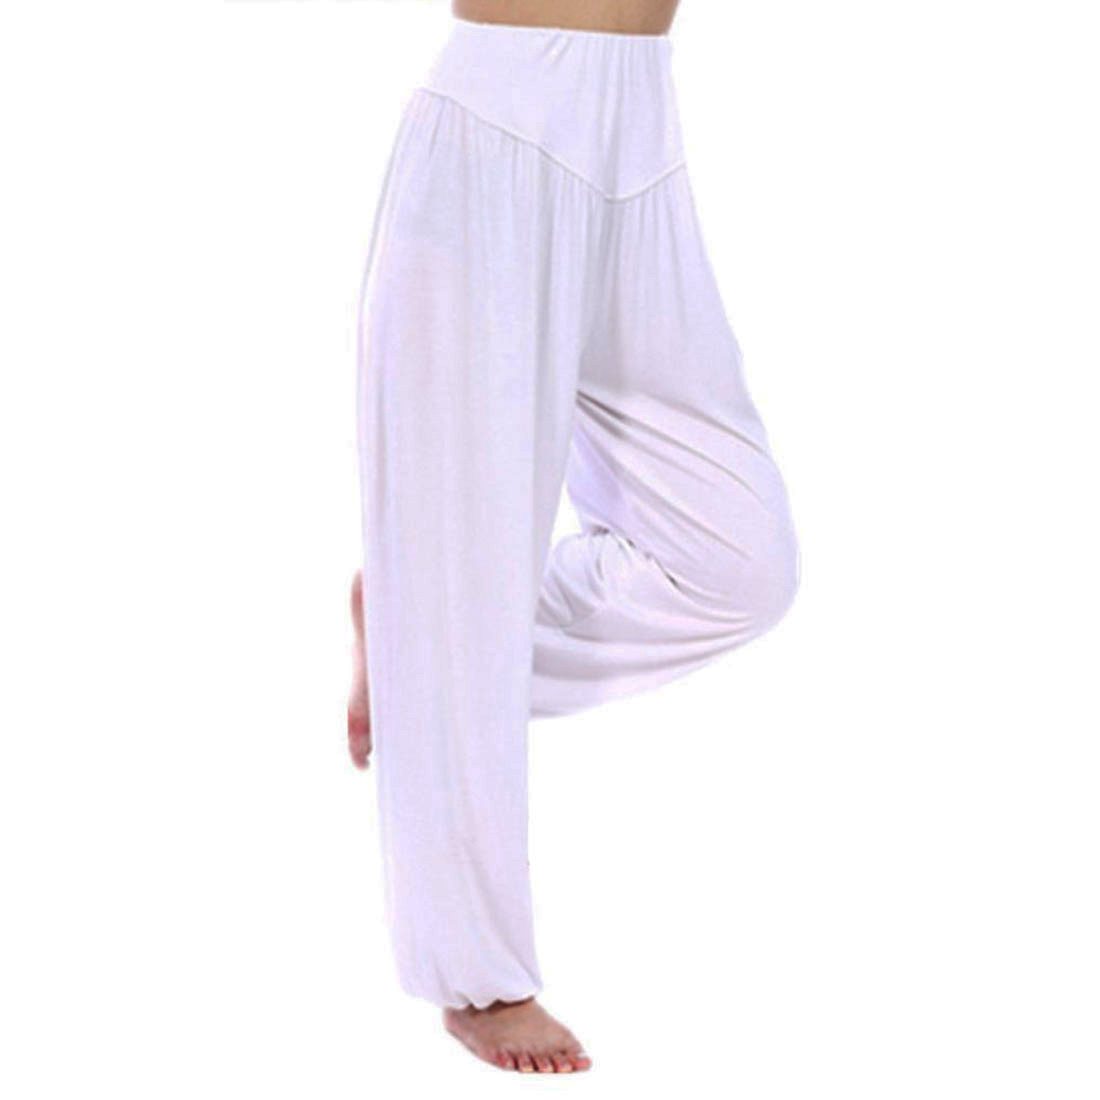 Simple 2016 New Women Casual Harem Pants High Waist Dance Pants Dance Club